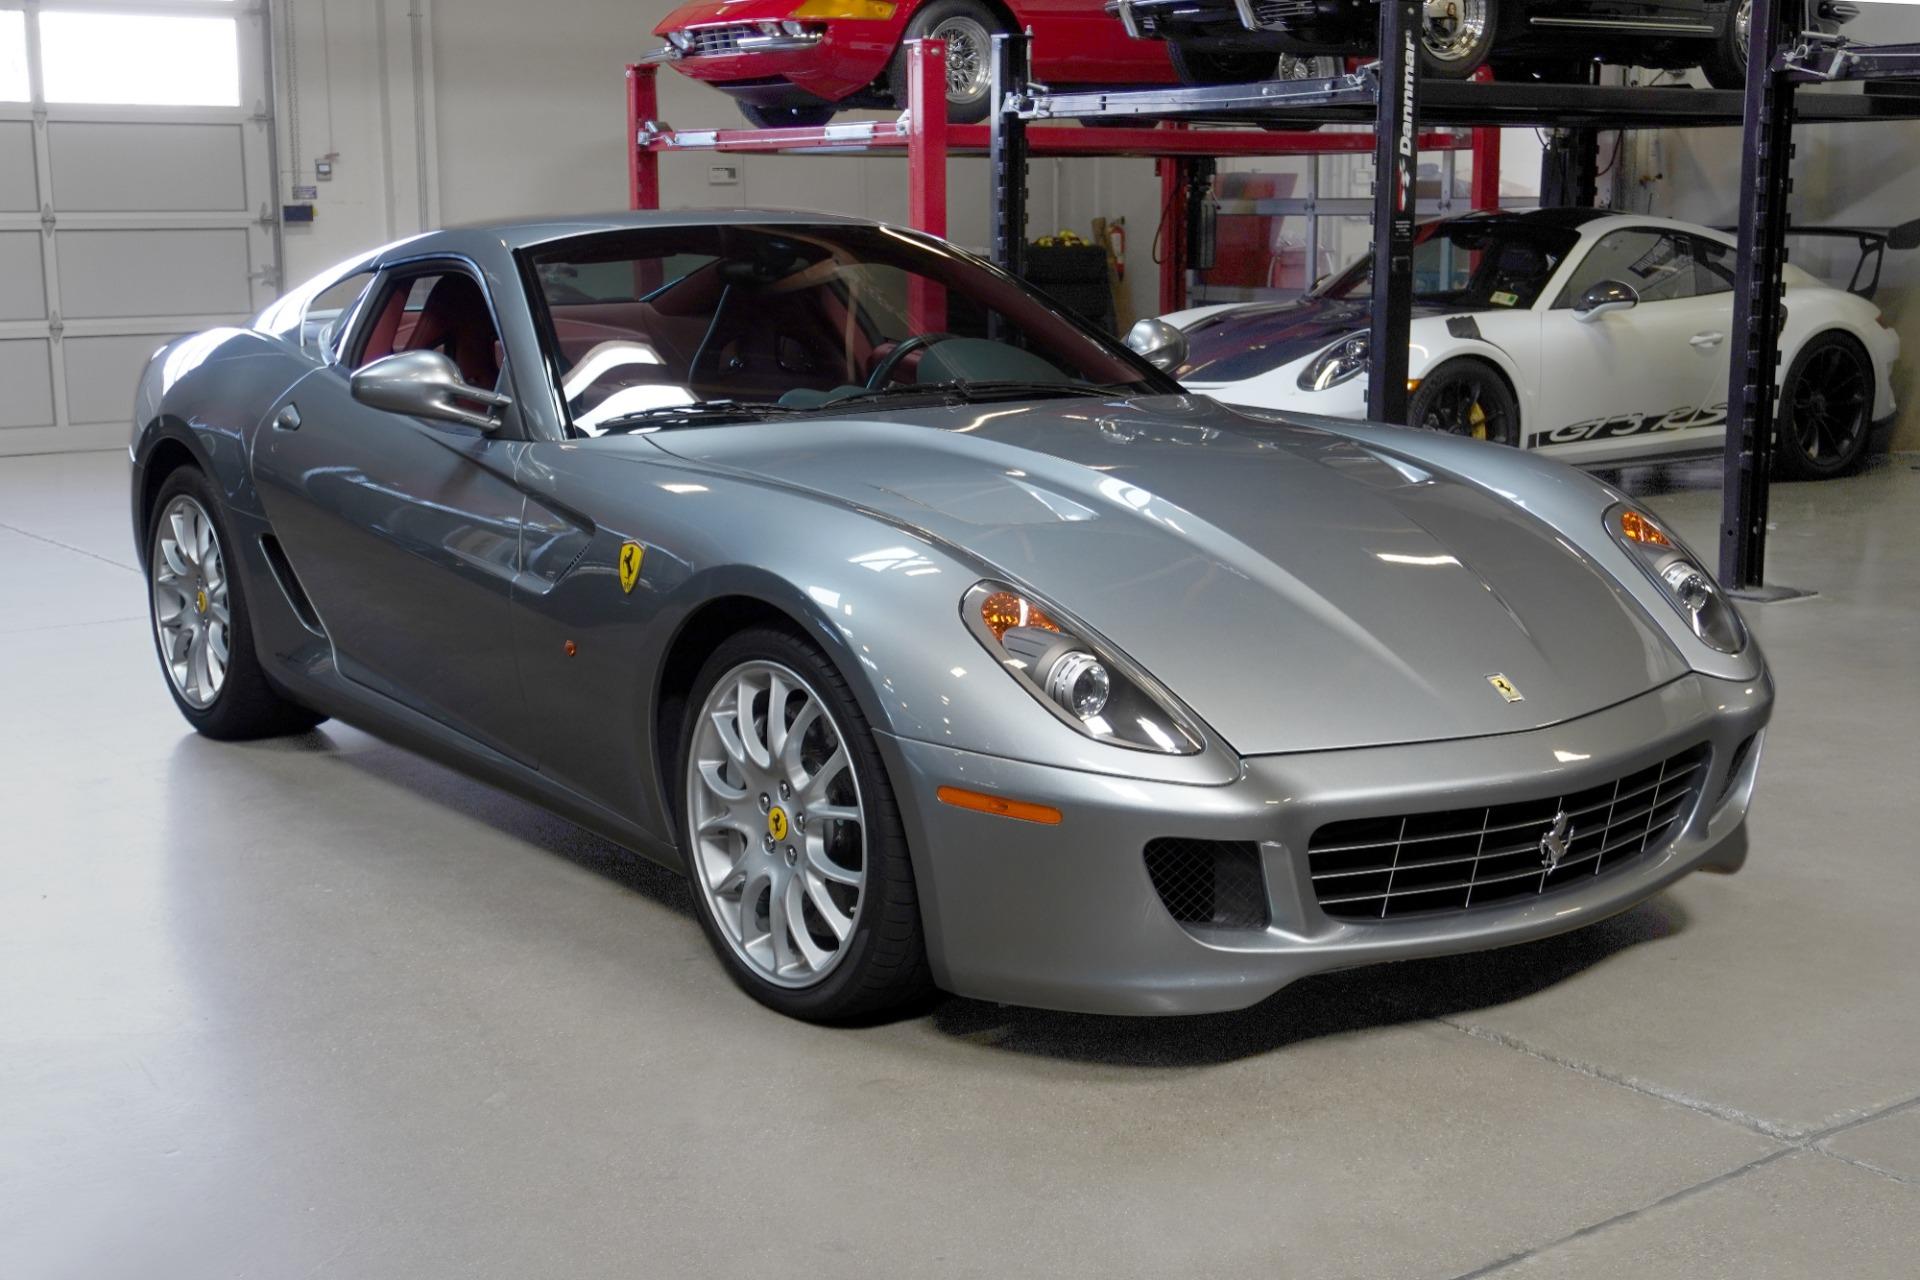 Used 2008 Ferrari 599 GTB Fiorano Base for sale Sold at San Francisco Sports Cars in San Carlos CA 94070 1